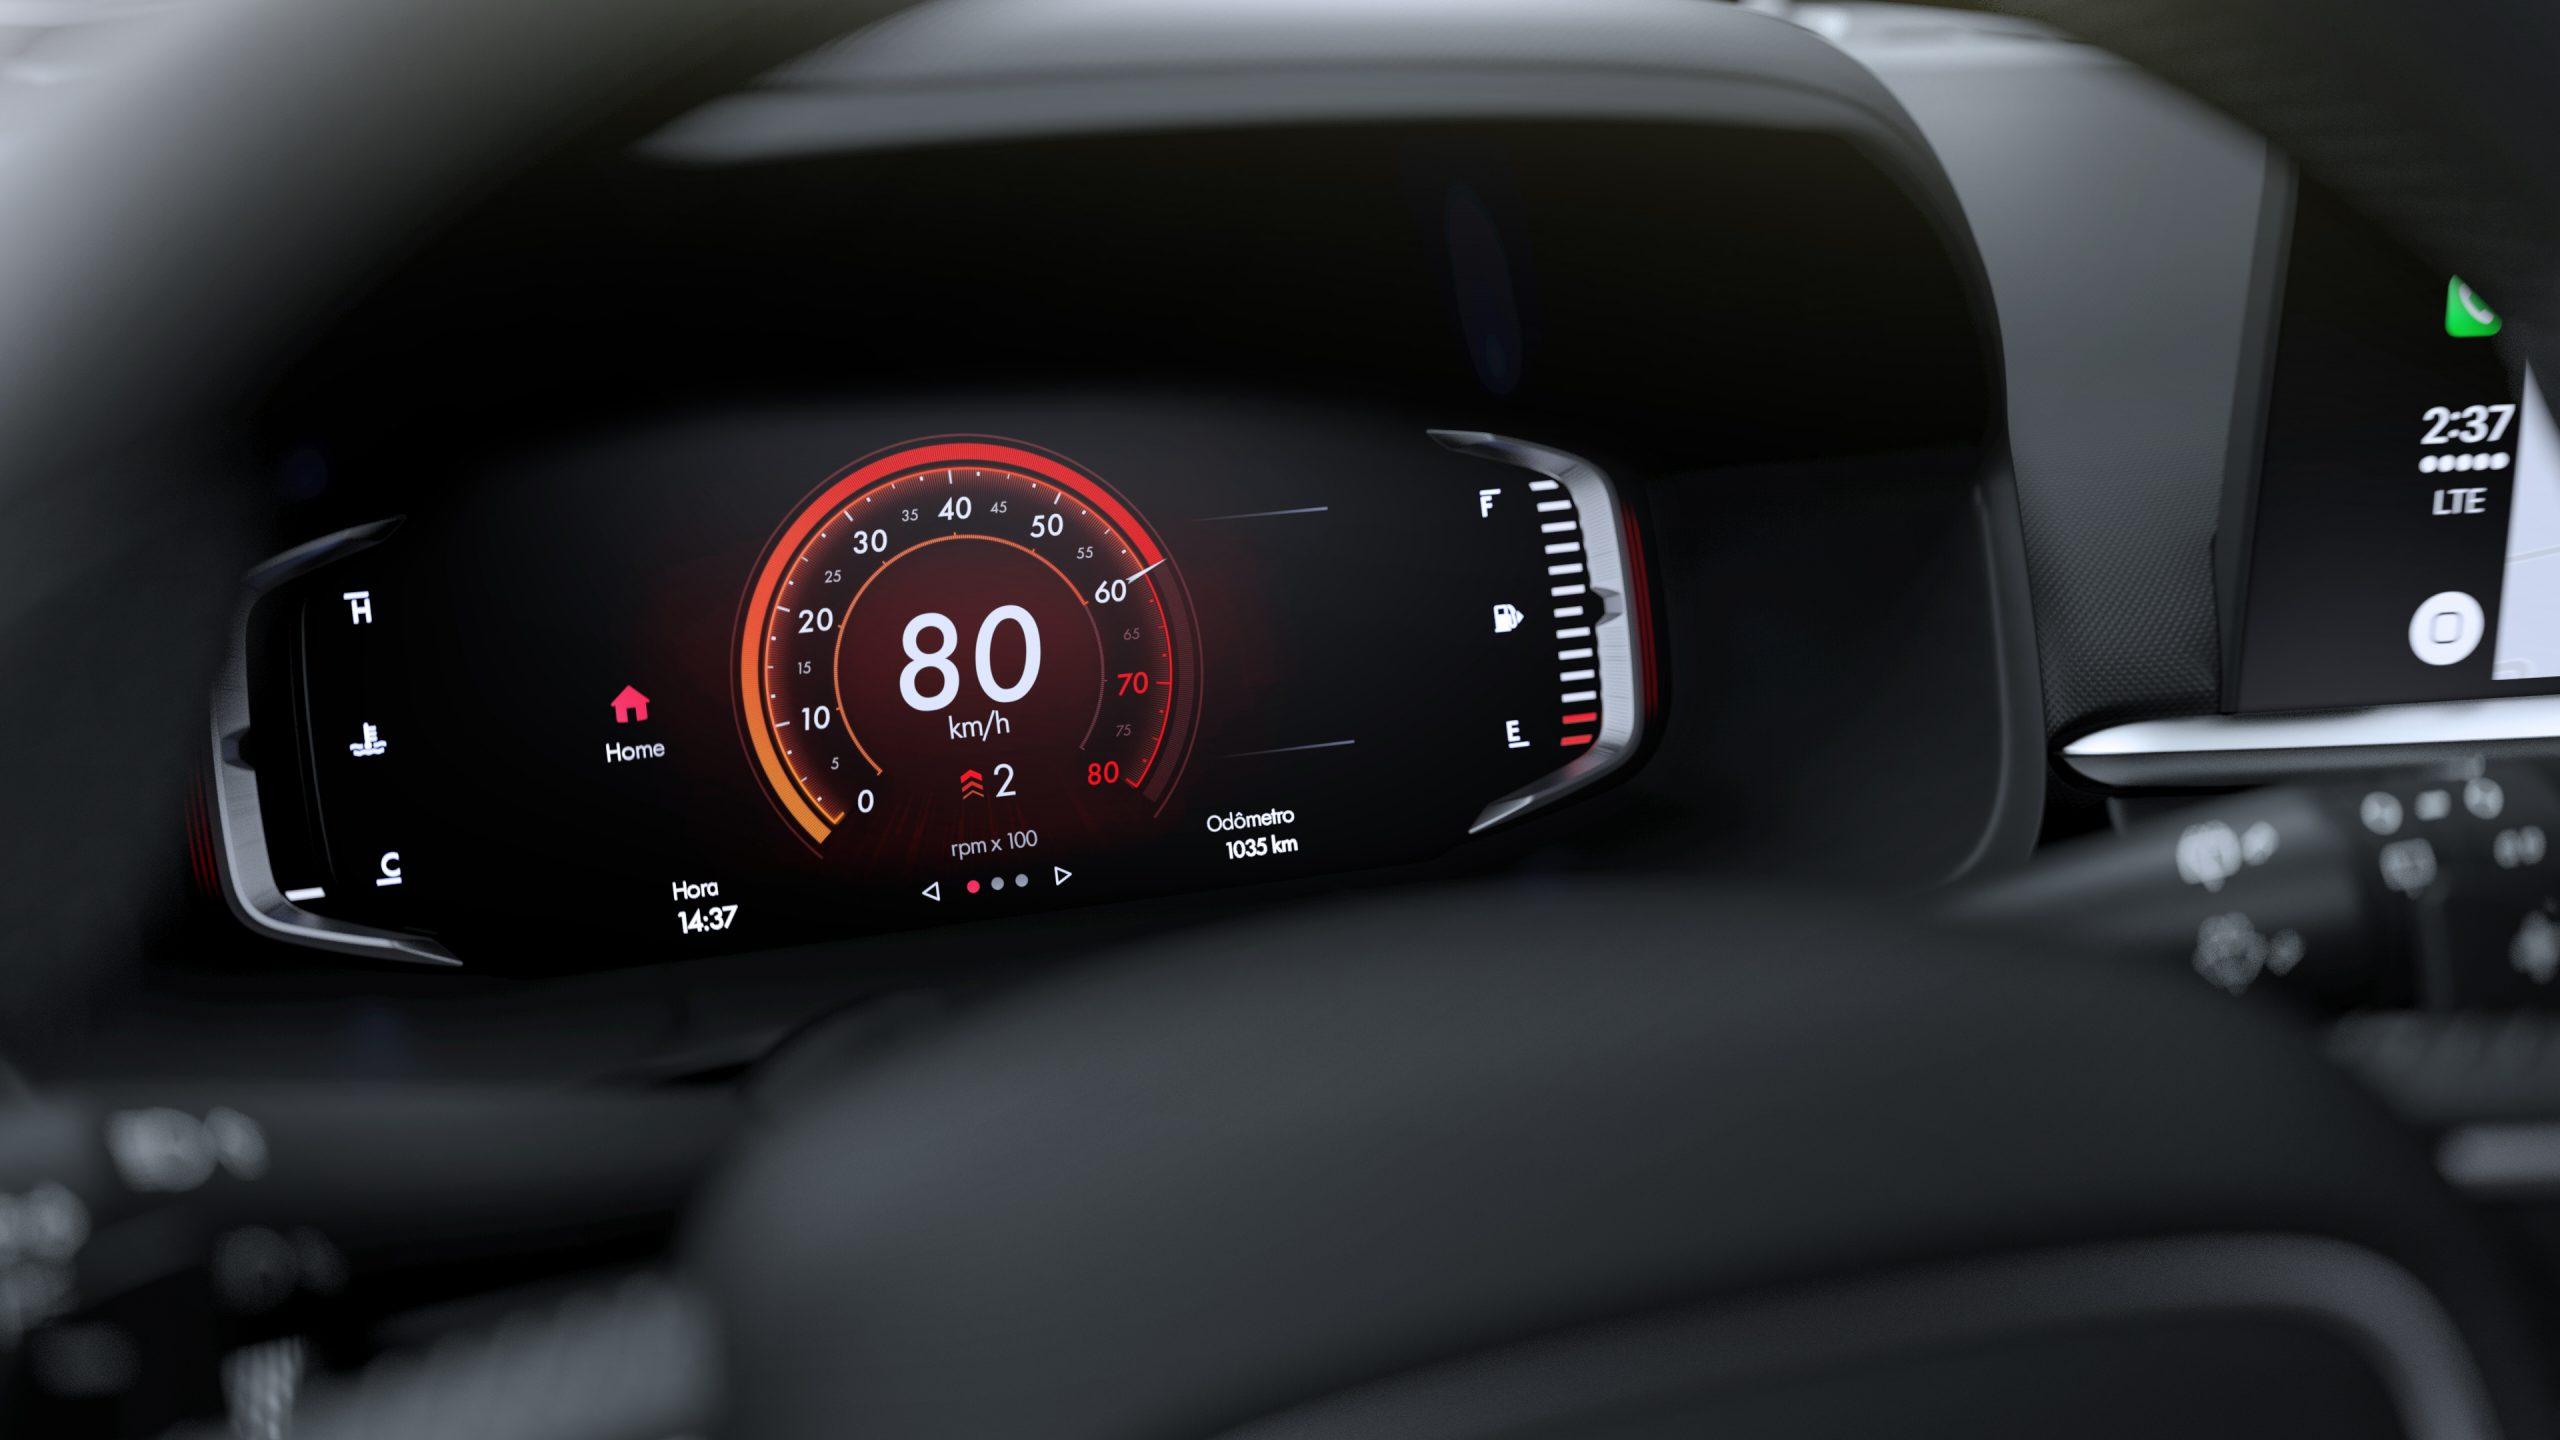 Fiat Pulse interior